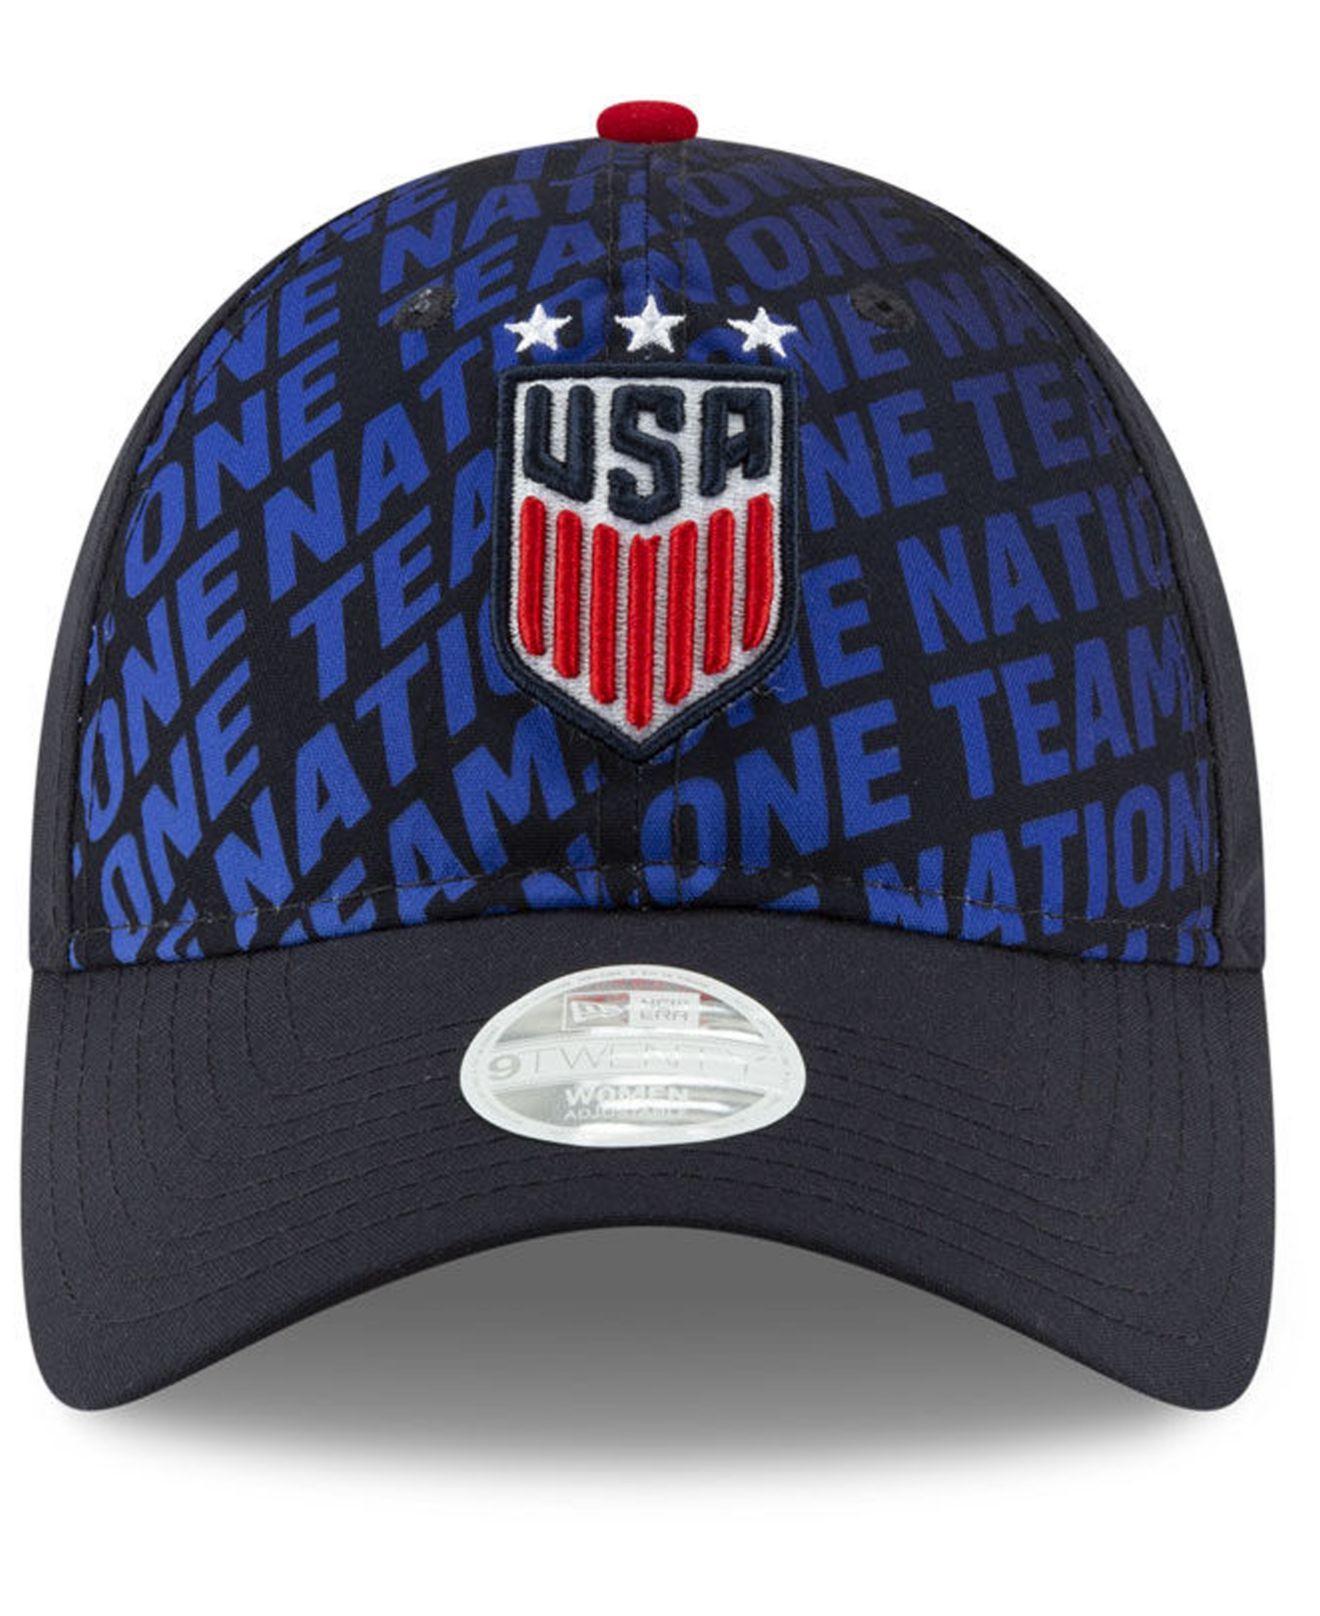 low priced 3db3d b498f KTZ Usa National Team Pride 9twenty Adjustable Cap in Blue - Lyst